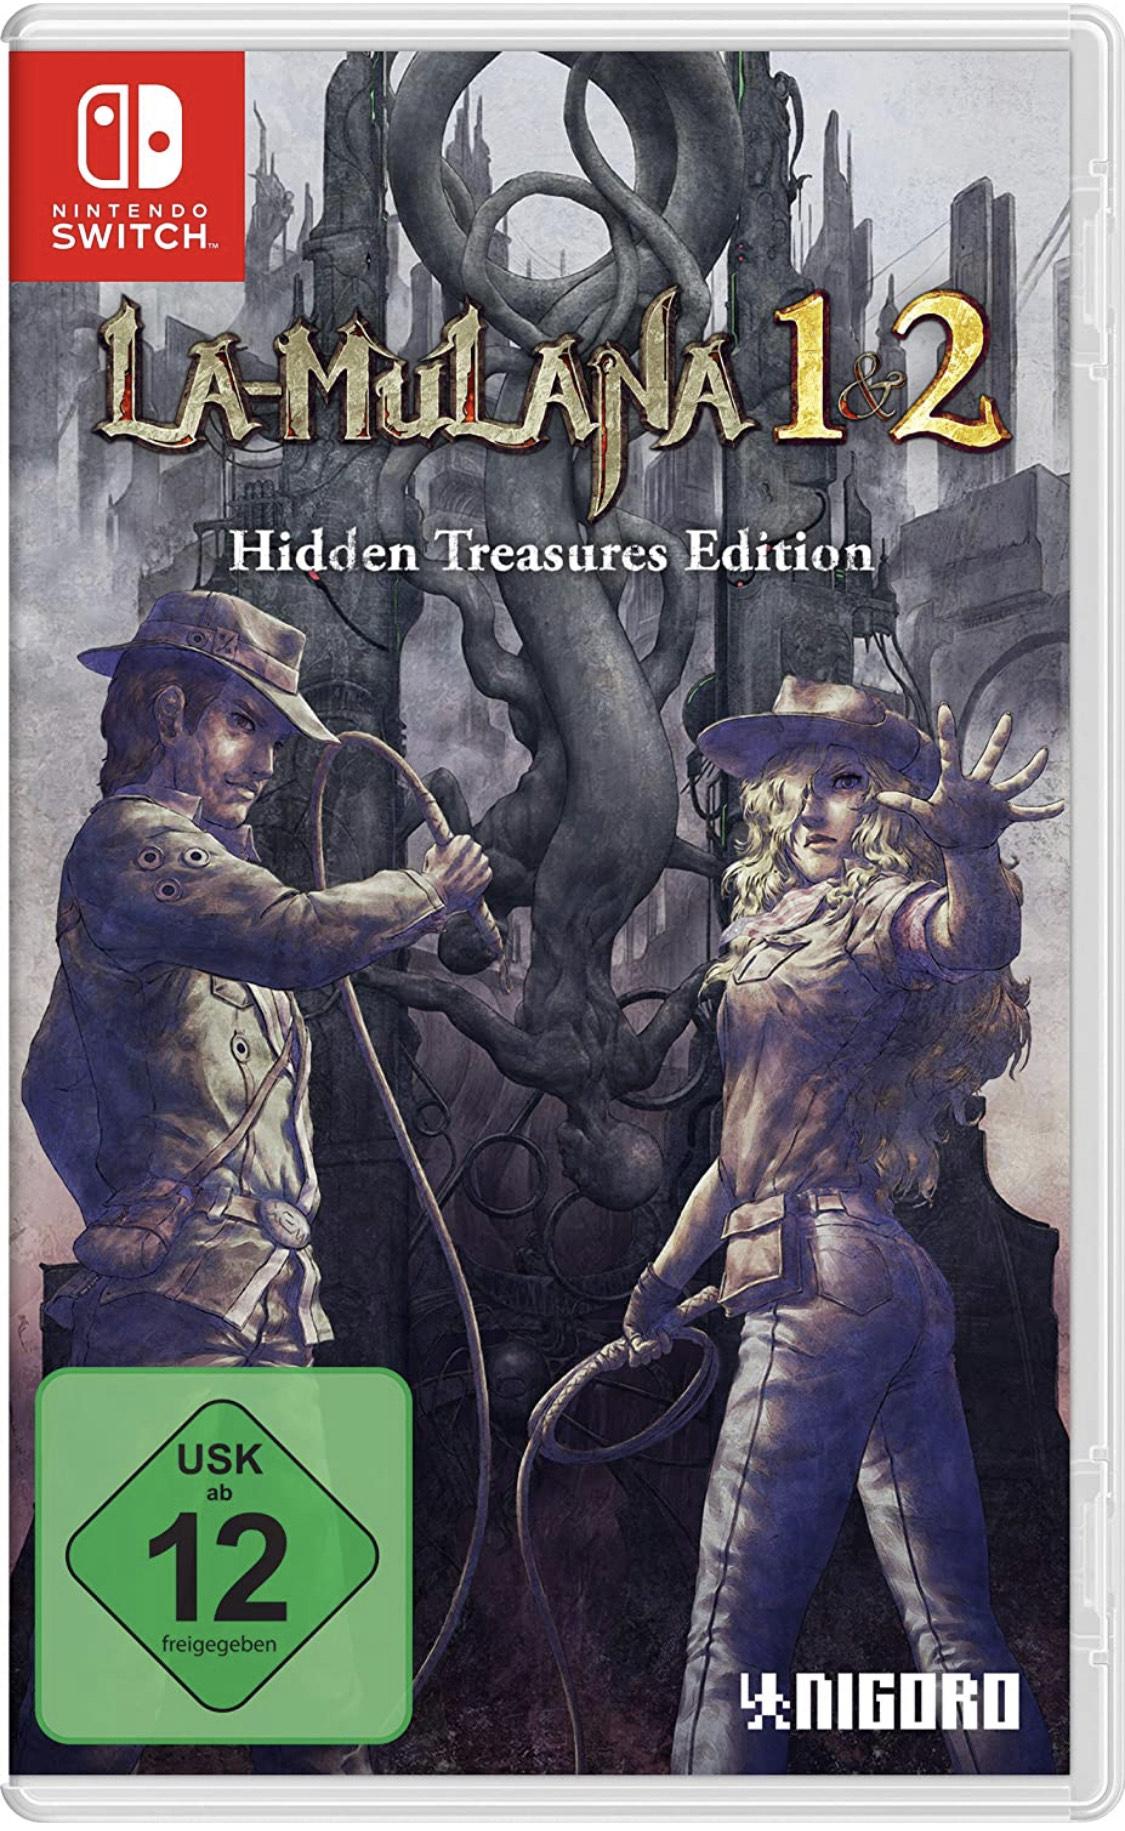 LA-MULANA 1 & 2: Hidden Treasures Edition [XNintendo Switch]